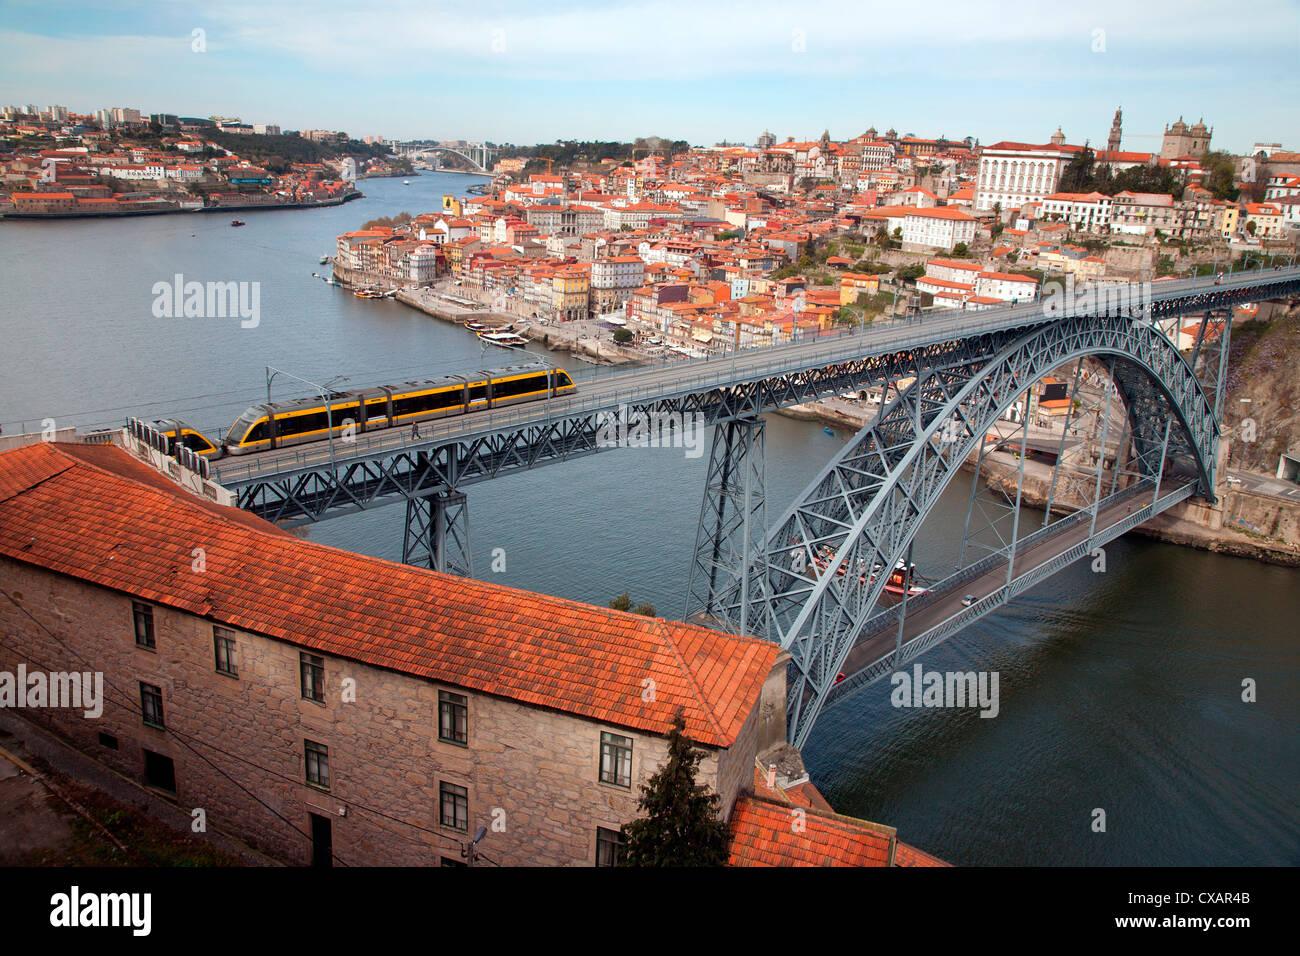 The Dom Luis 1 Bridge over the River Douro showing Metro light rail in transit and Arrabida Bridge in background, - Stock Image